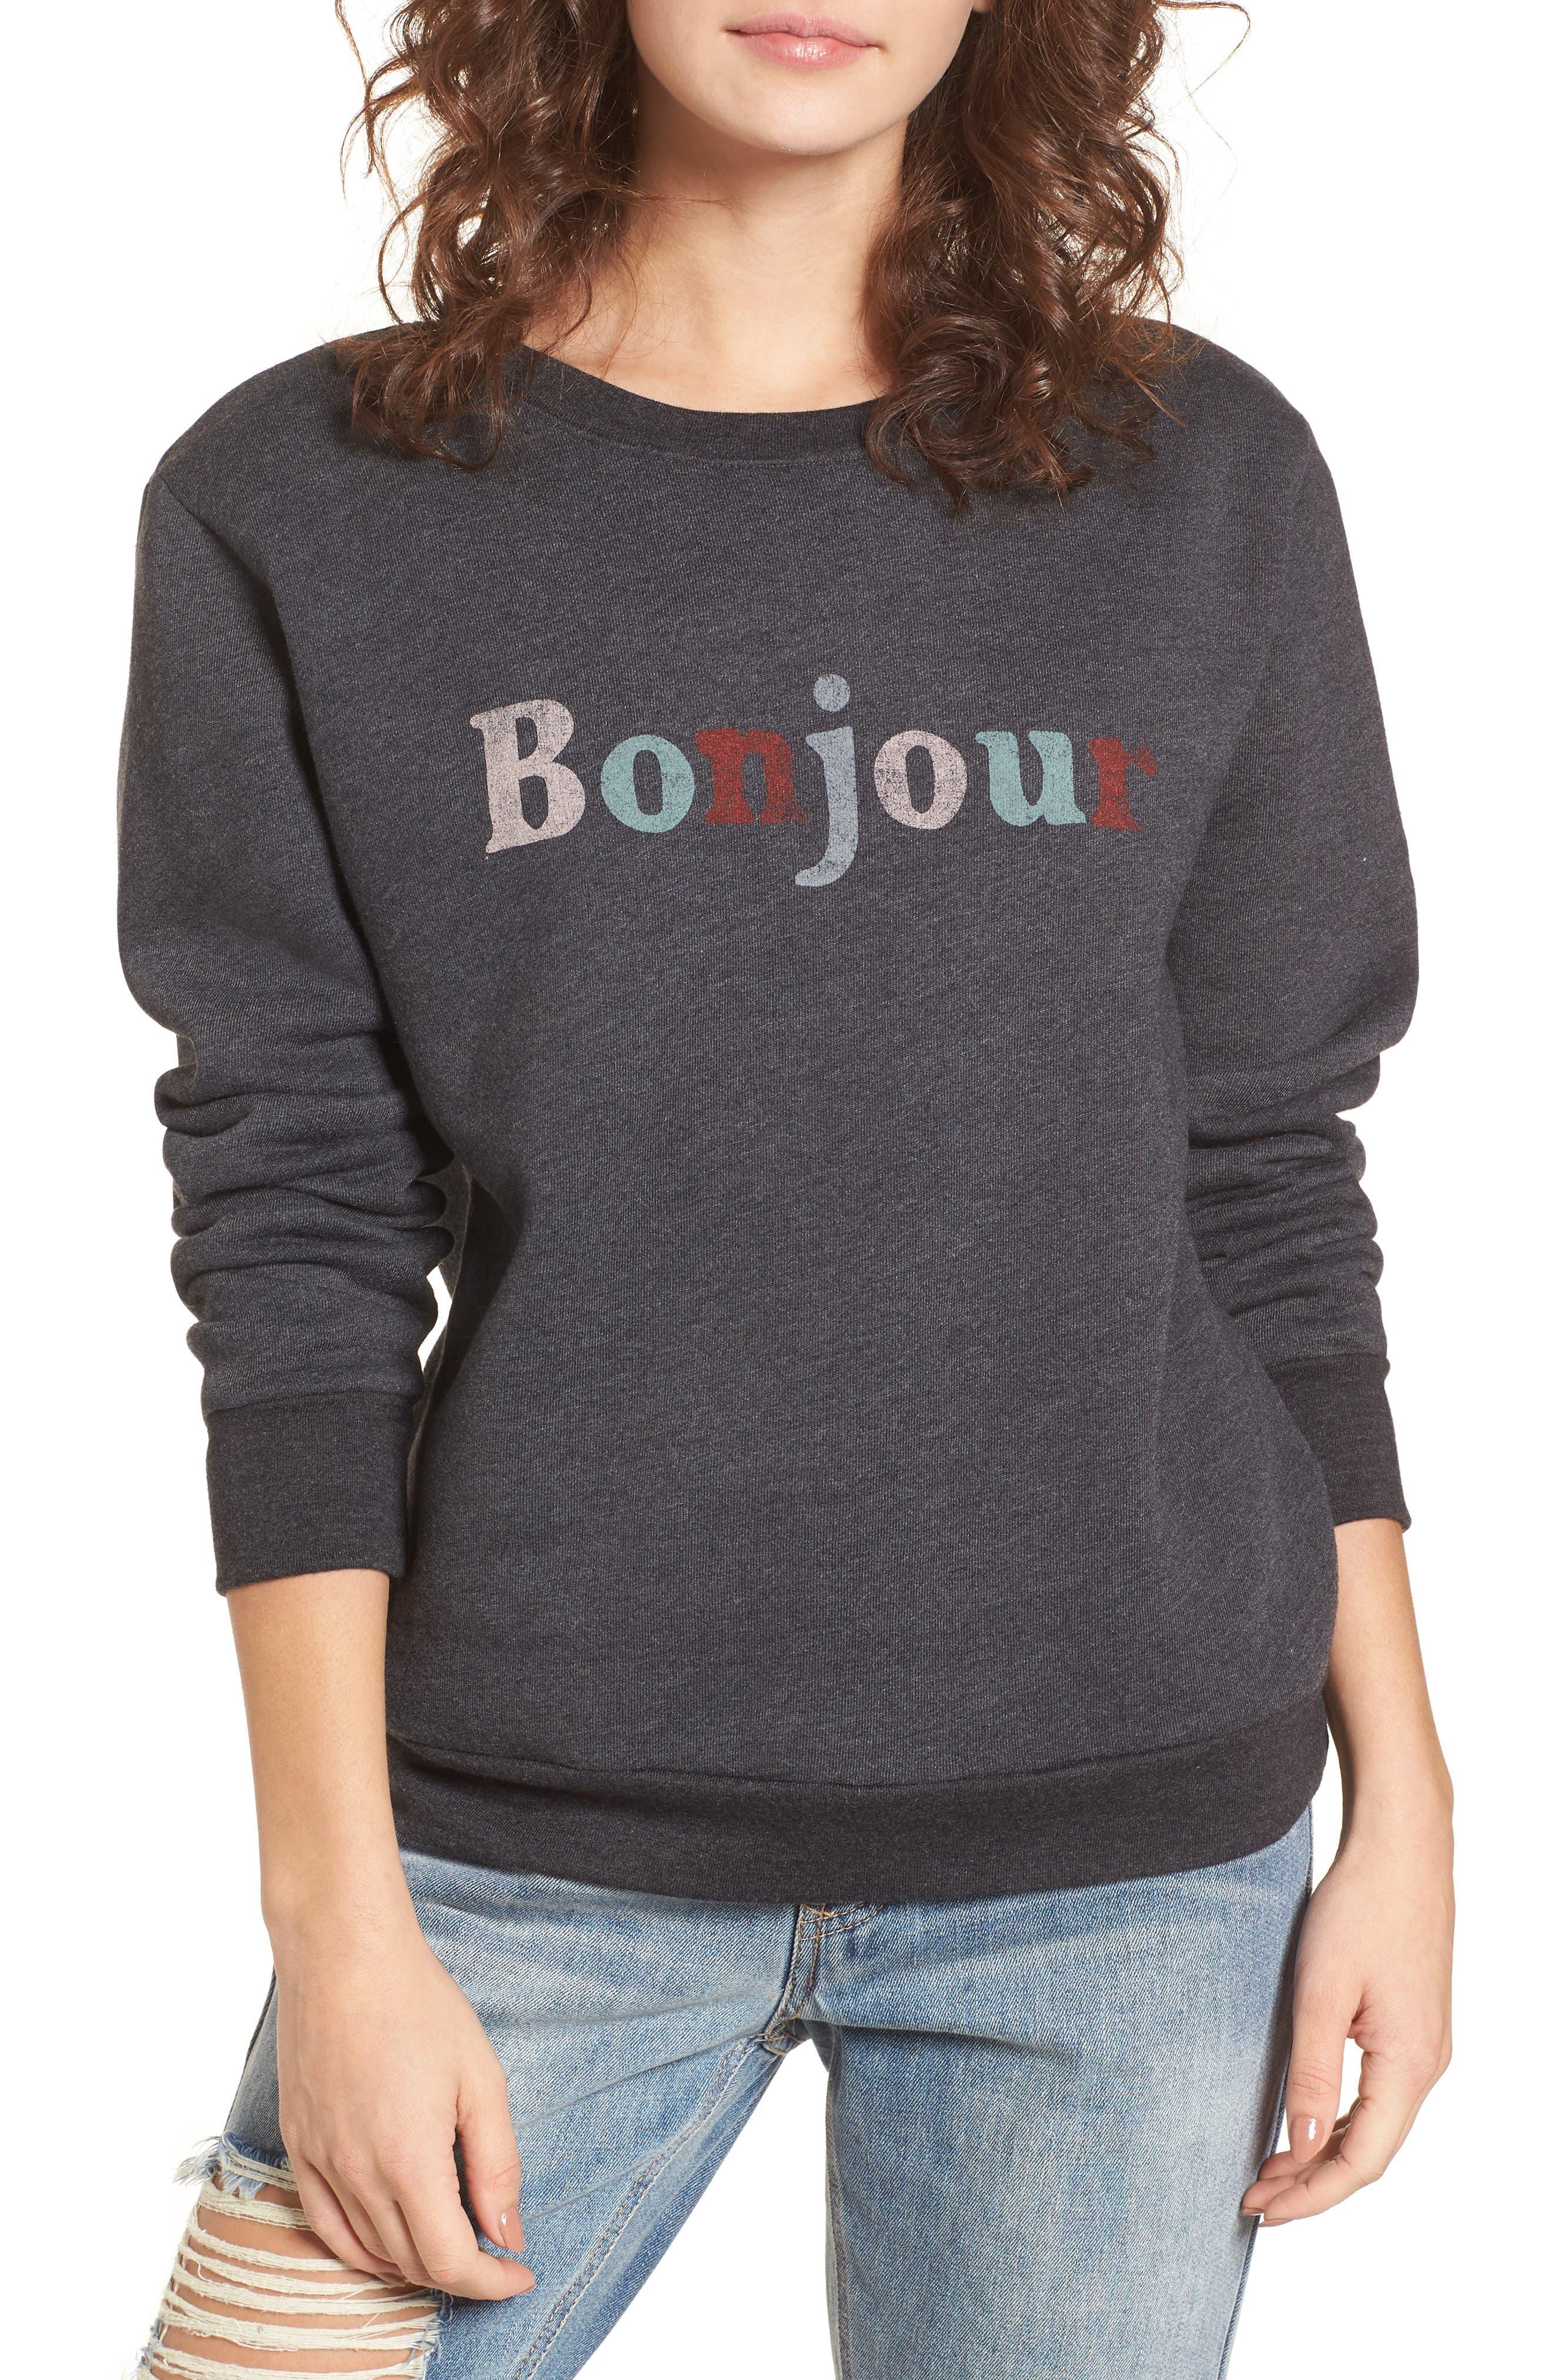 Bonjour Sweatshirt,                             Main thumbnail 1, color,                             Faded Black